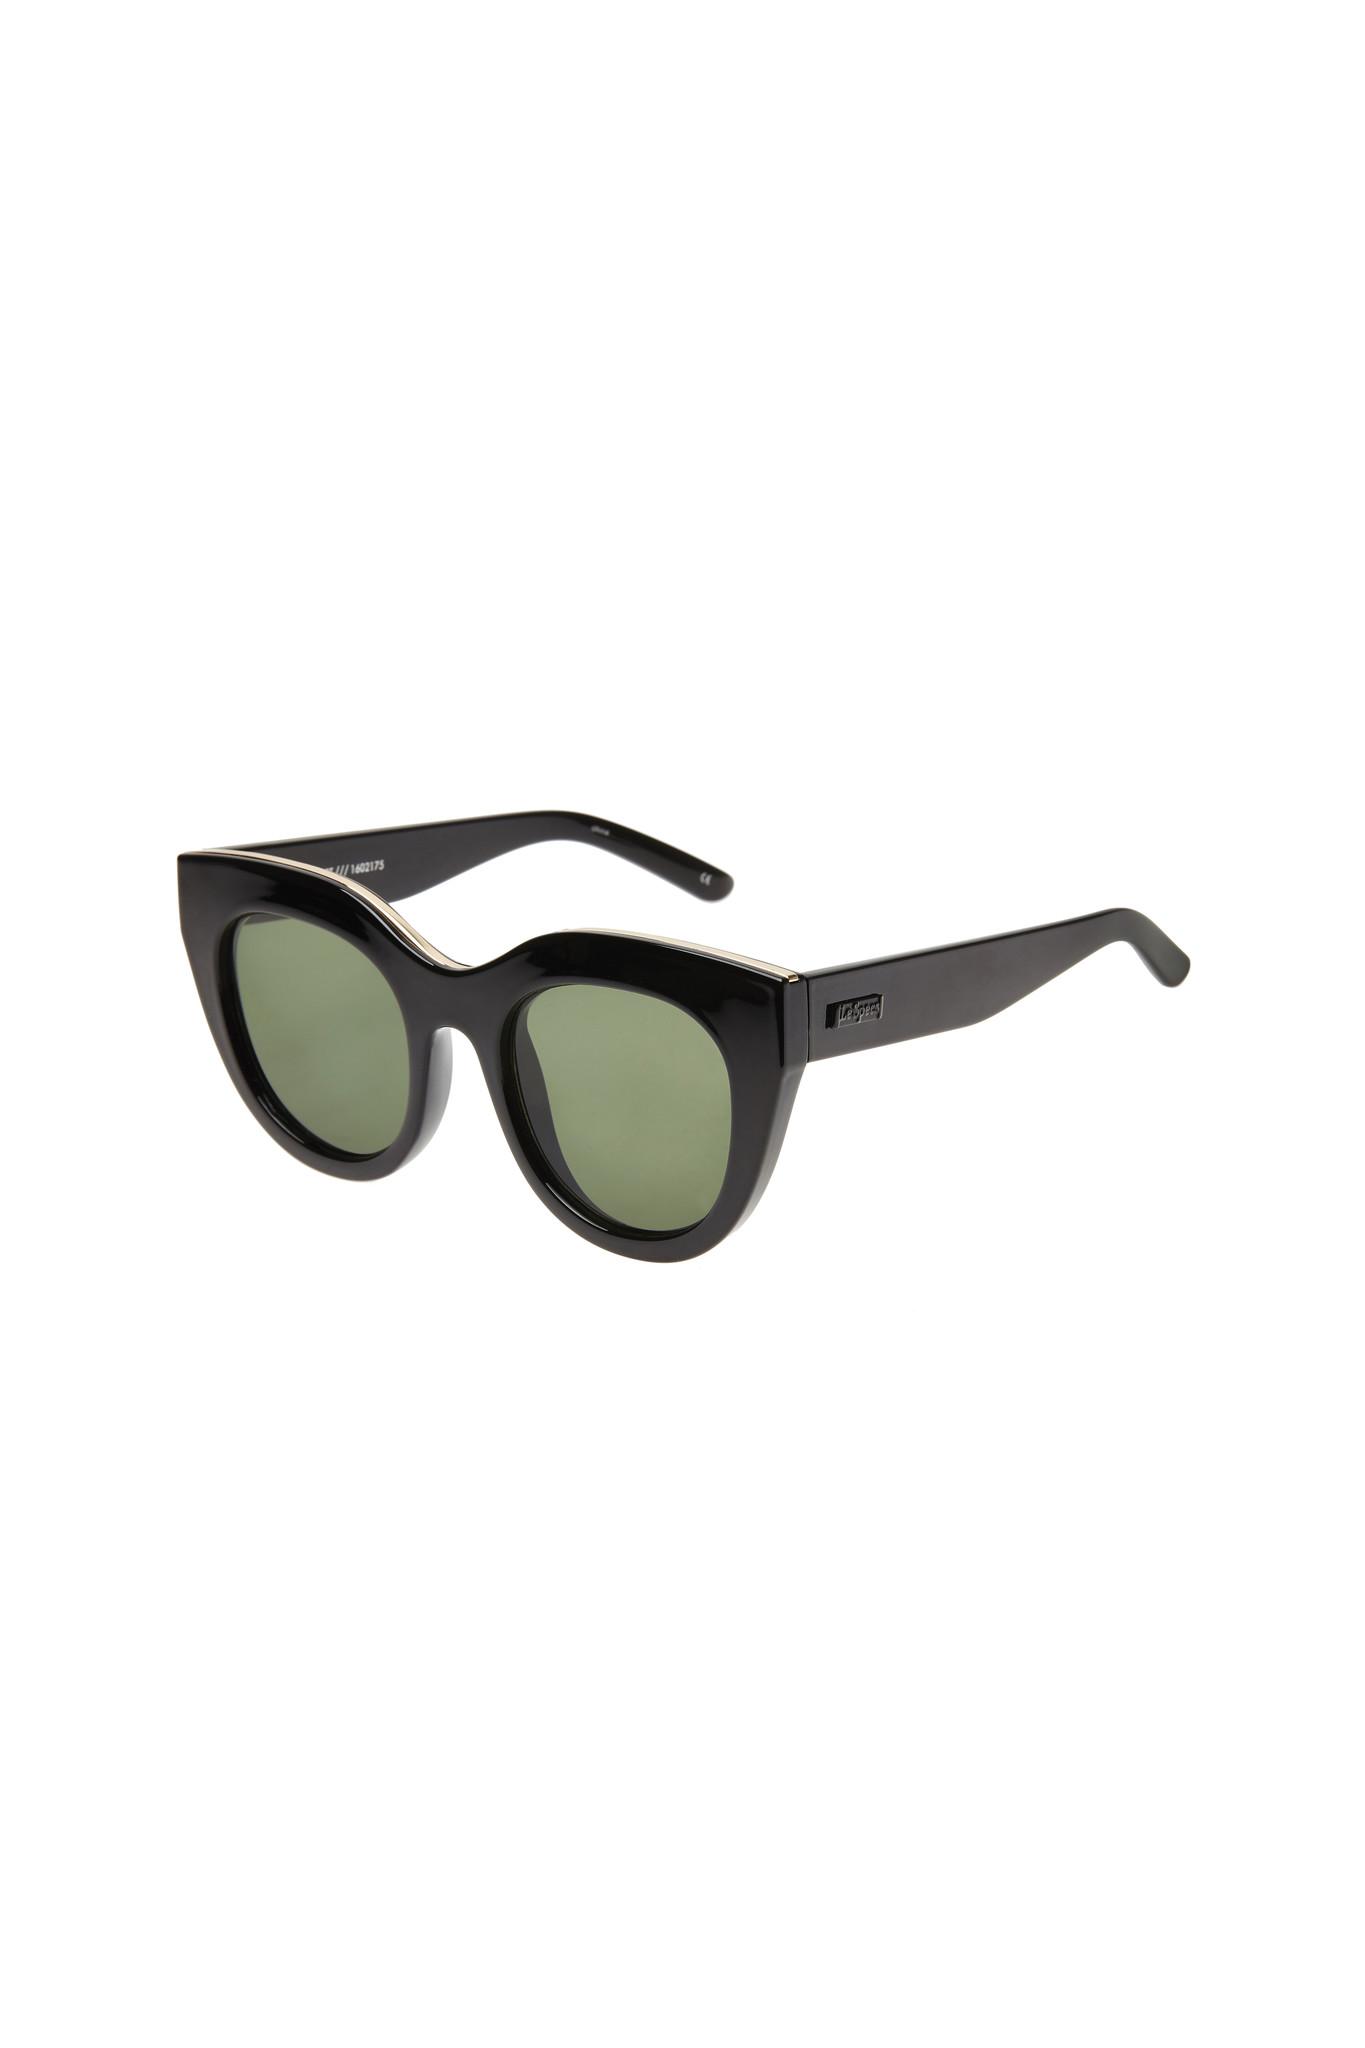 Air Heart Sunglasses - Black-5